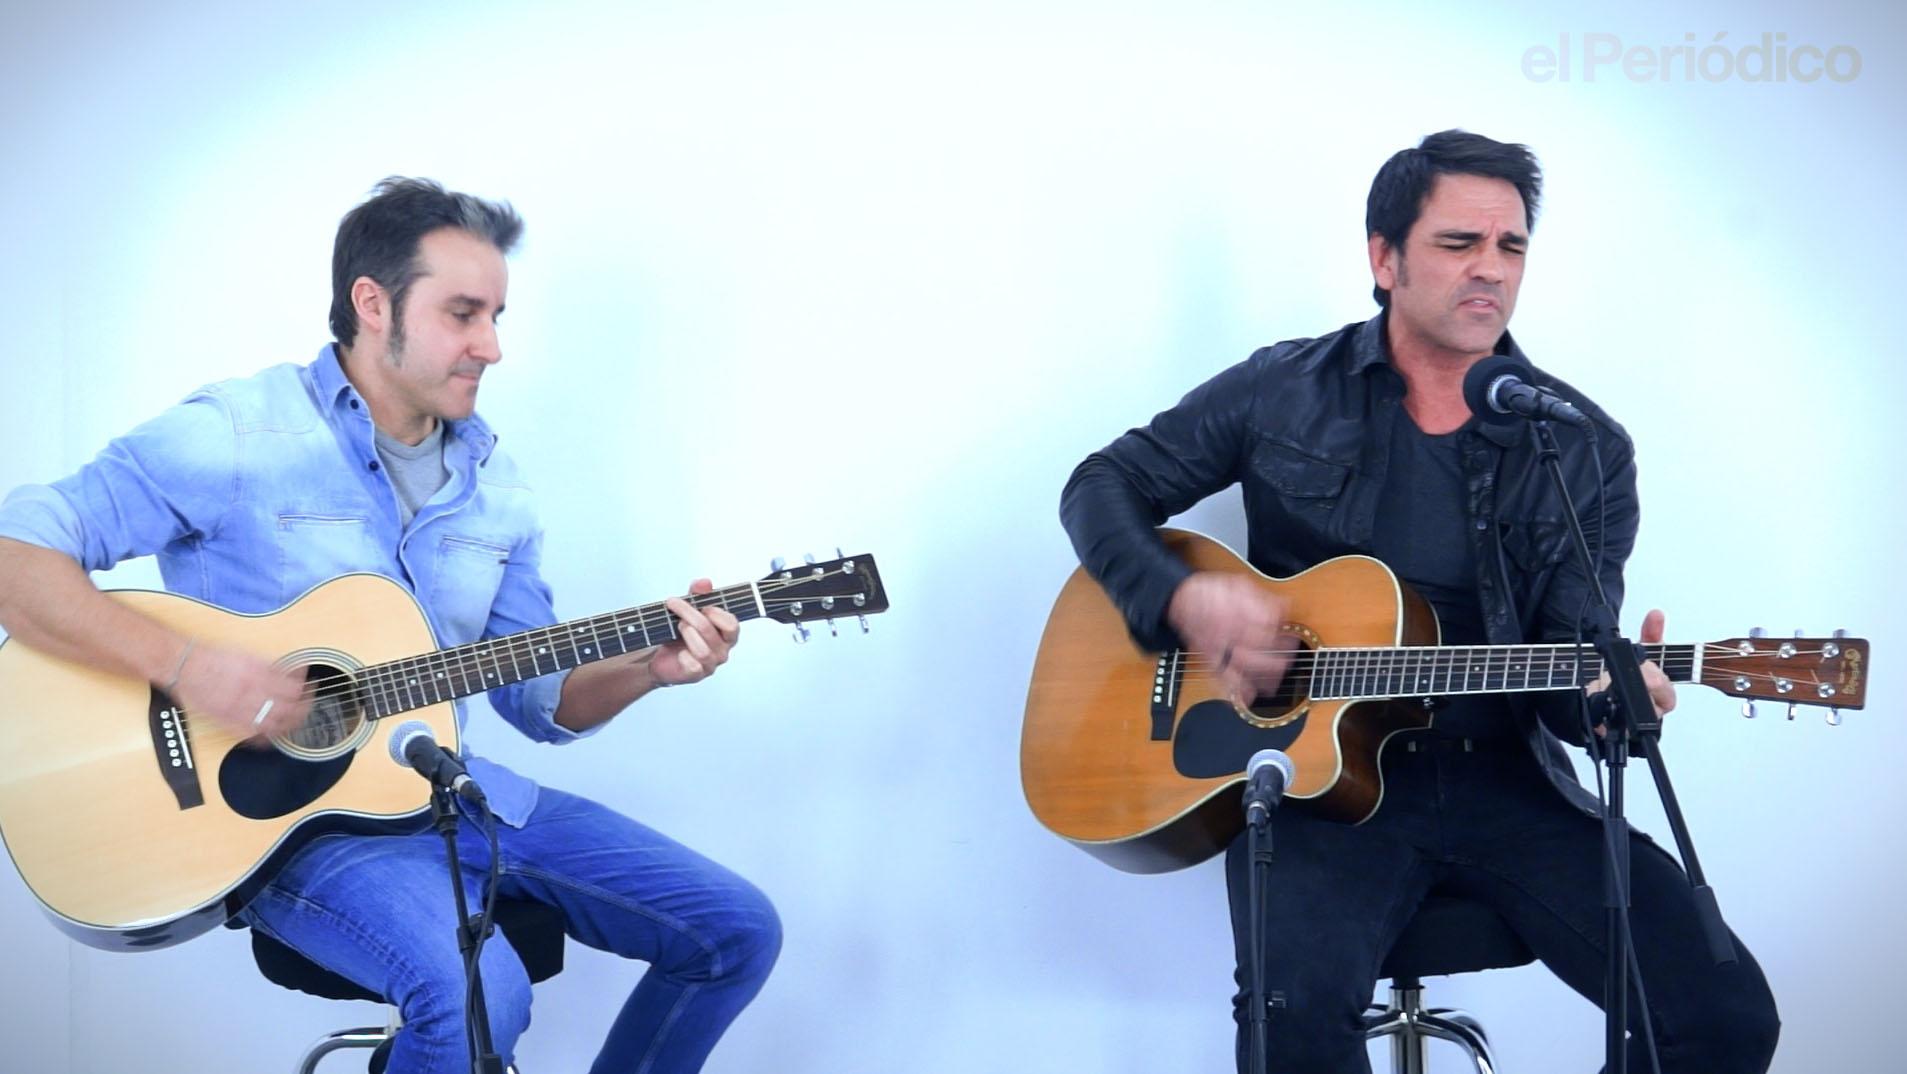 Música directa: Ricky Fargas interpreta 'Bicho malo'